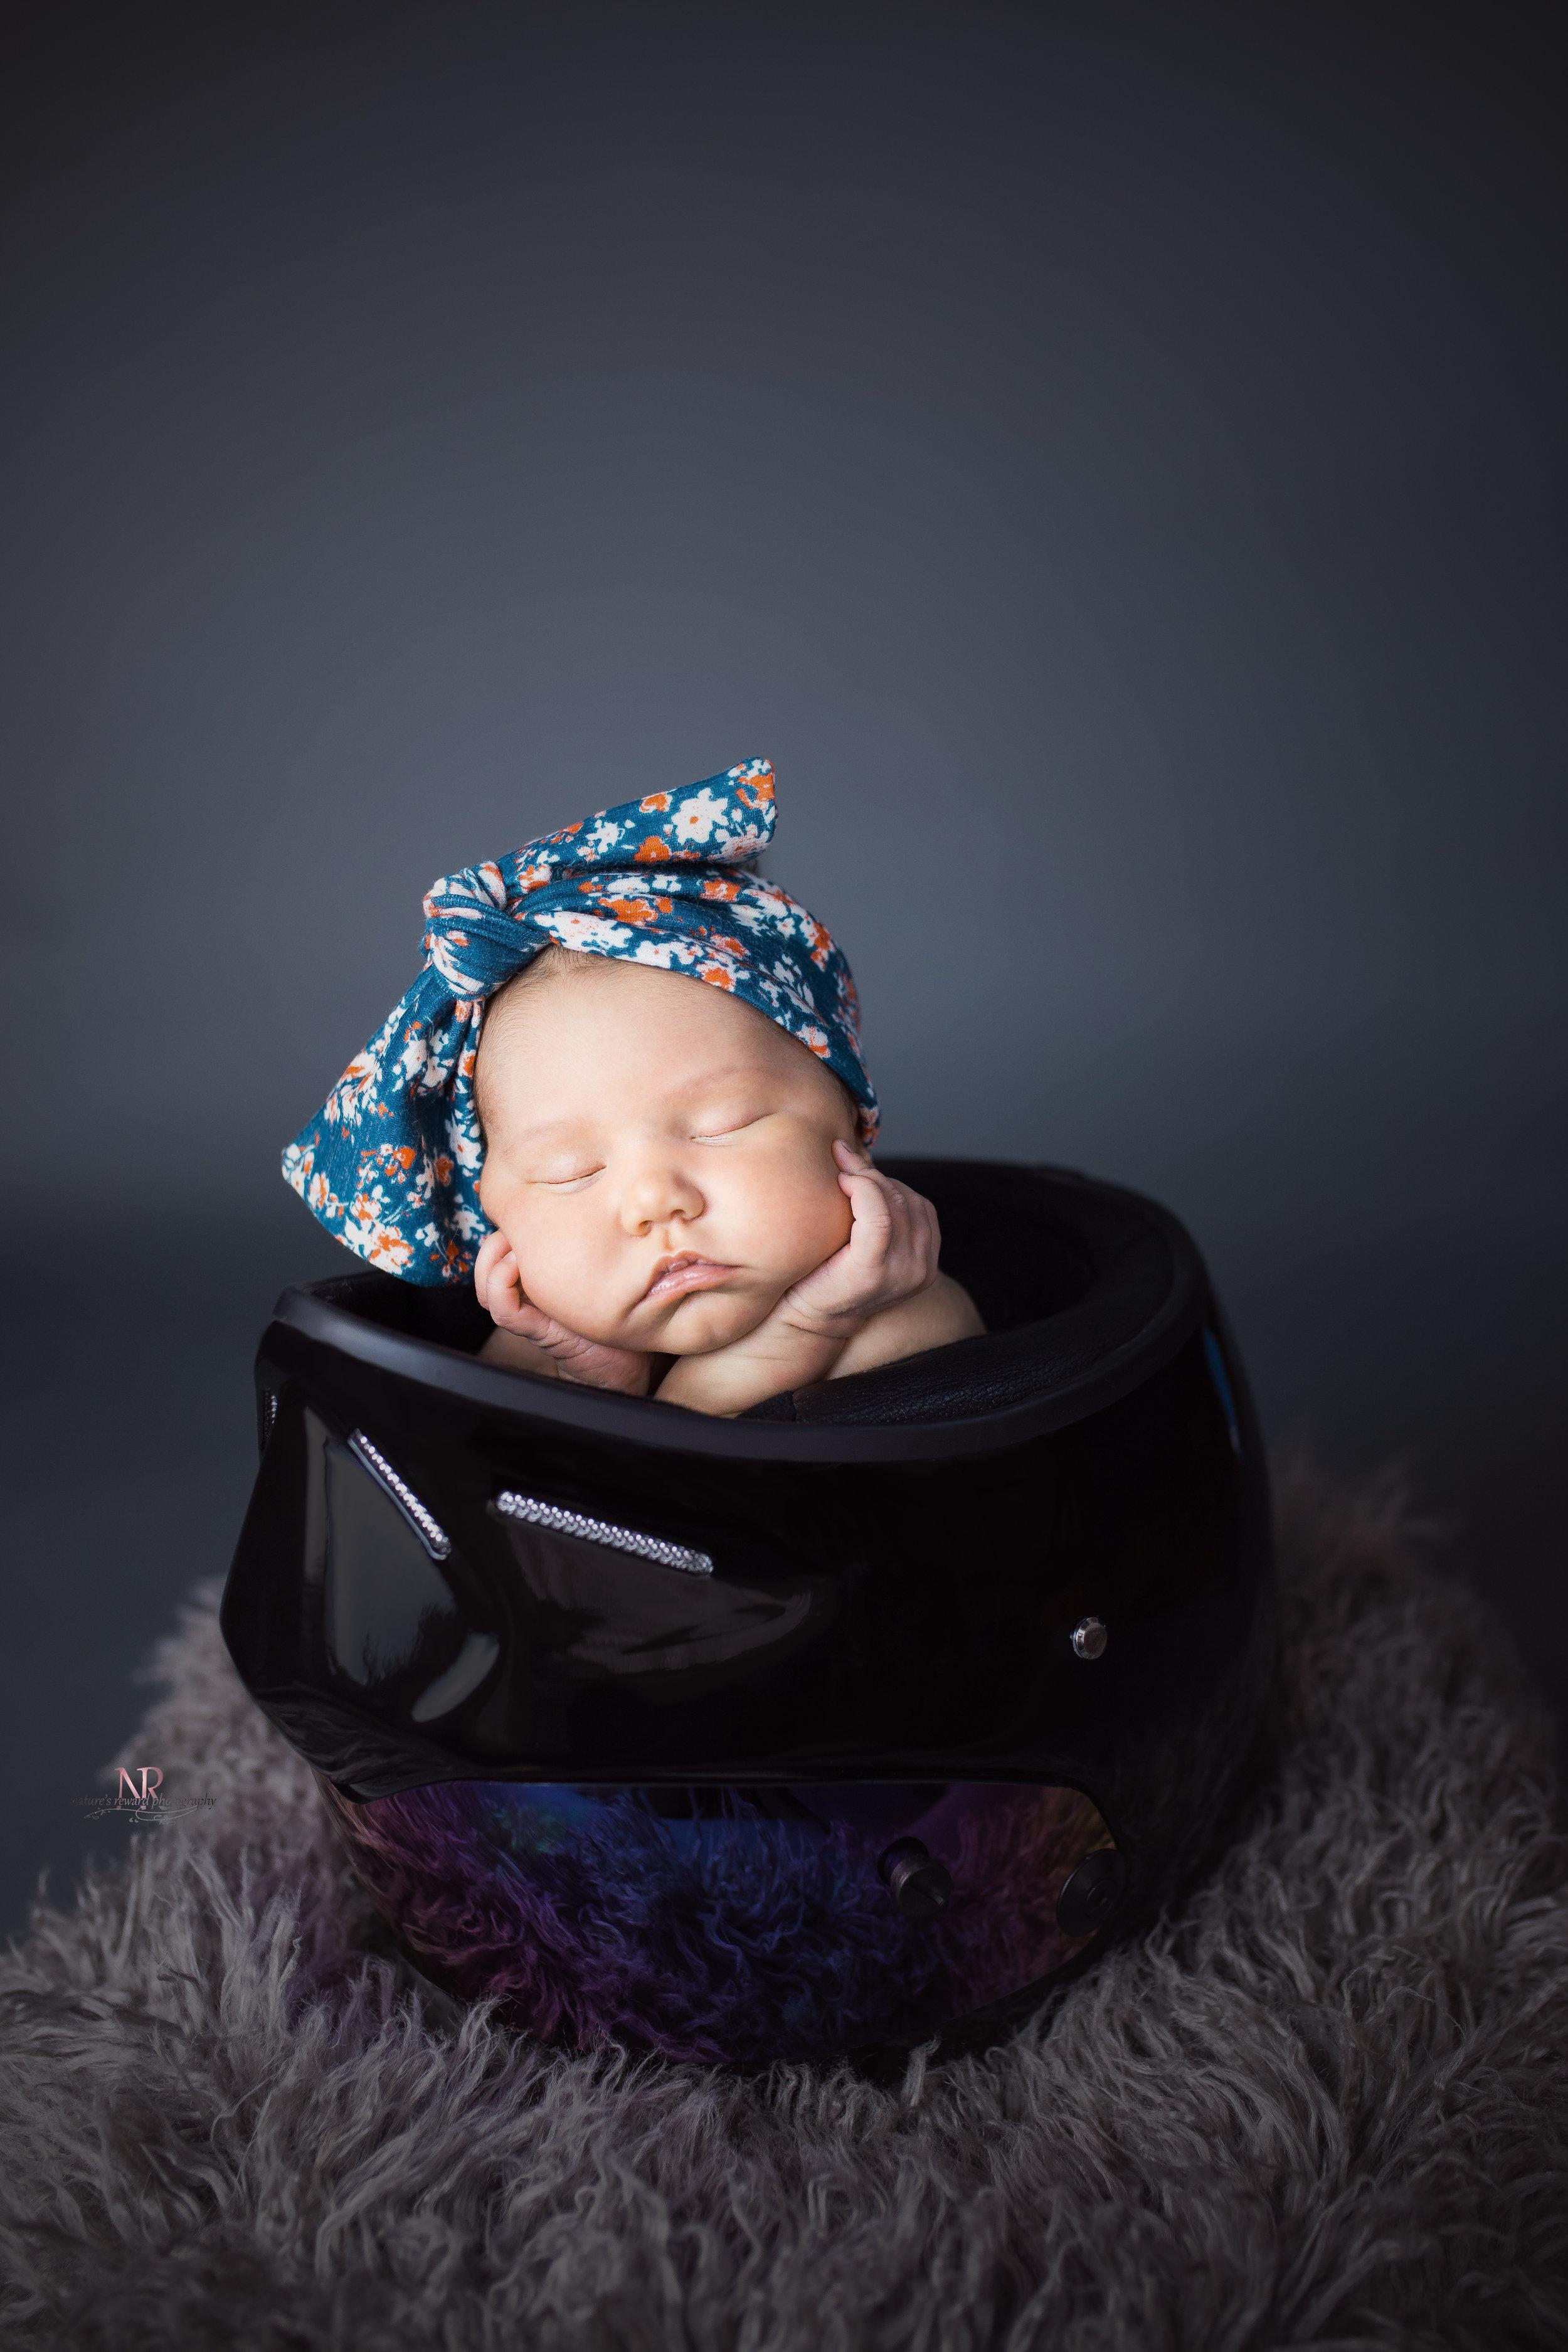 Newborn portrait in color of baby girl in her dad's motorcycle helmet taken by Nature's Reward Photography